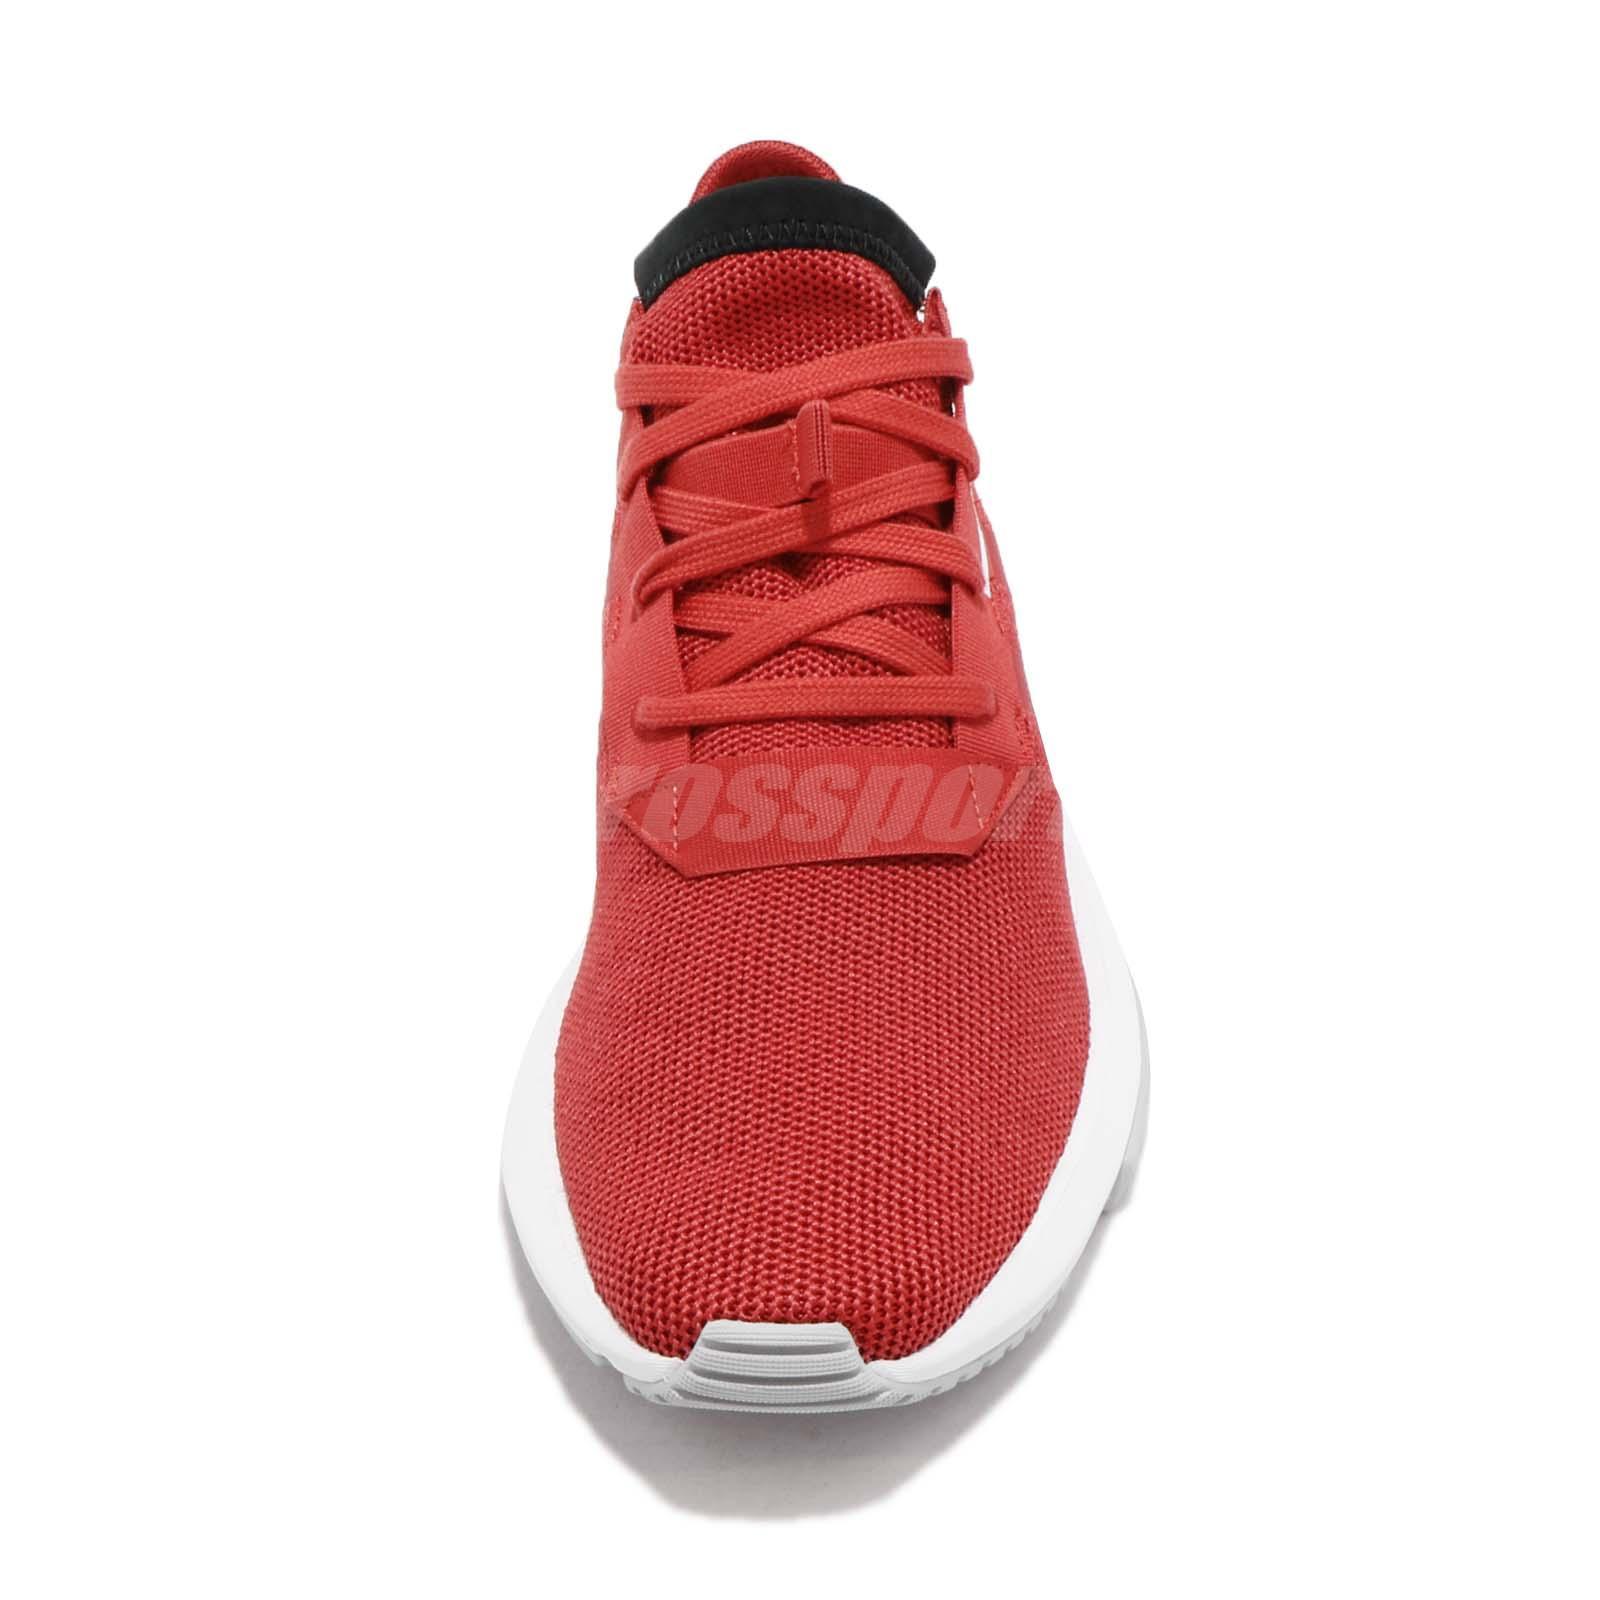 adidas Originals POD-S3.1 System Tactile Red Men Running Shoes ... d82536b1fe3